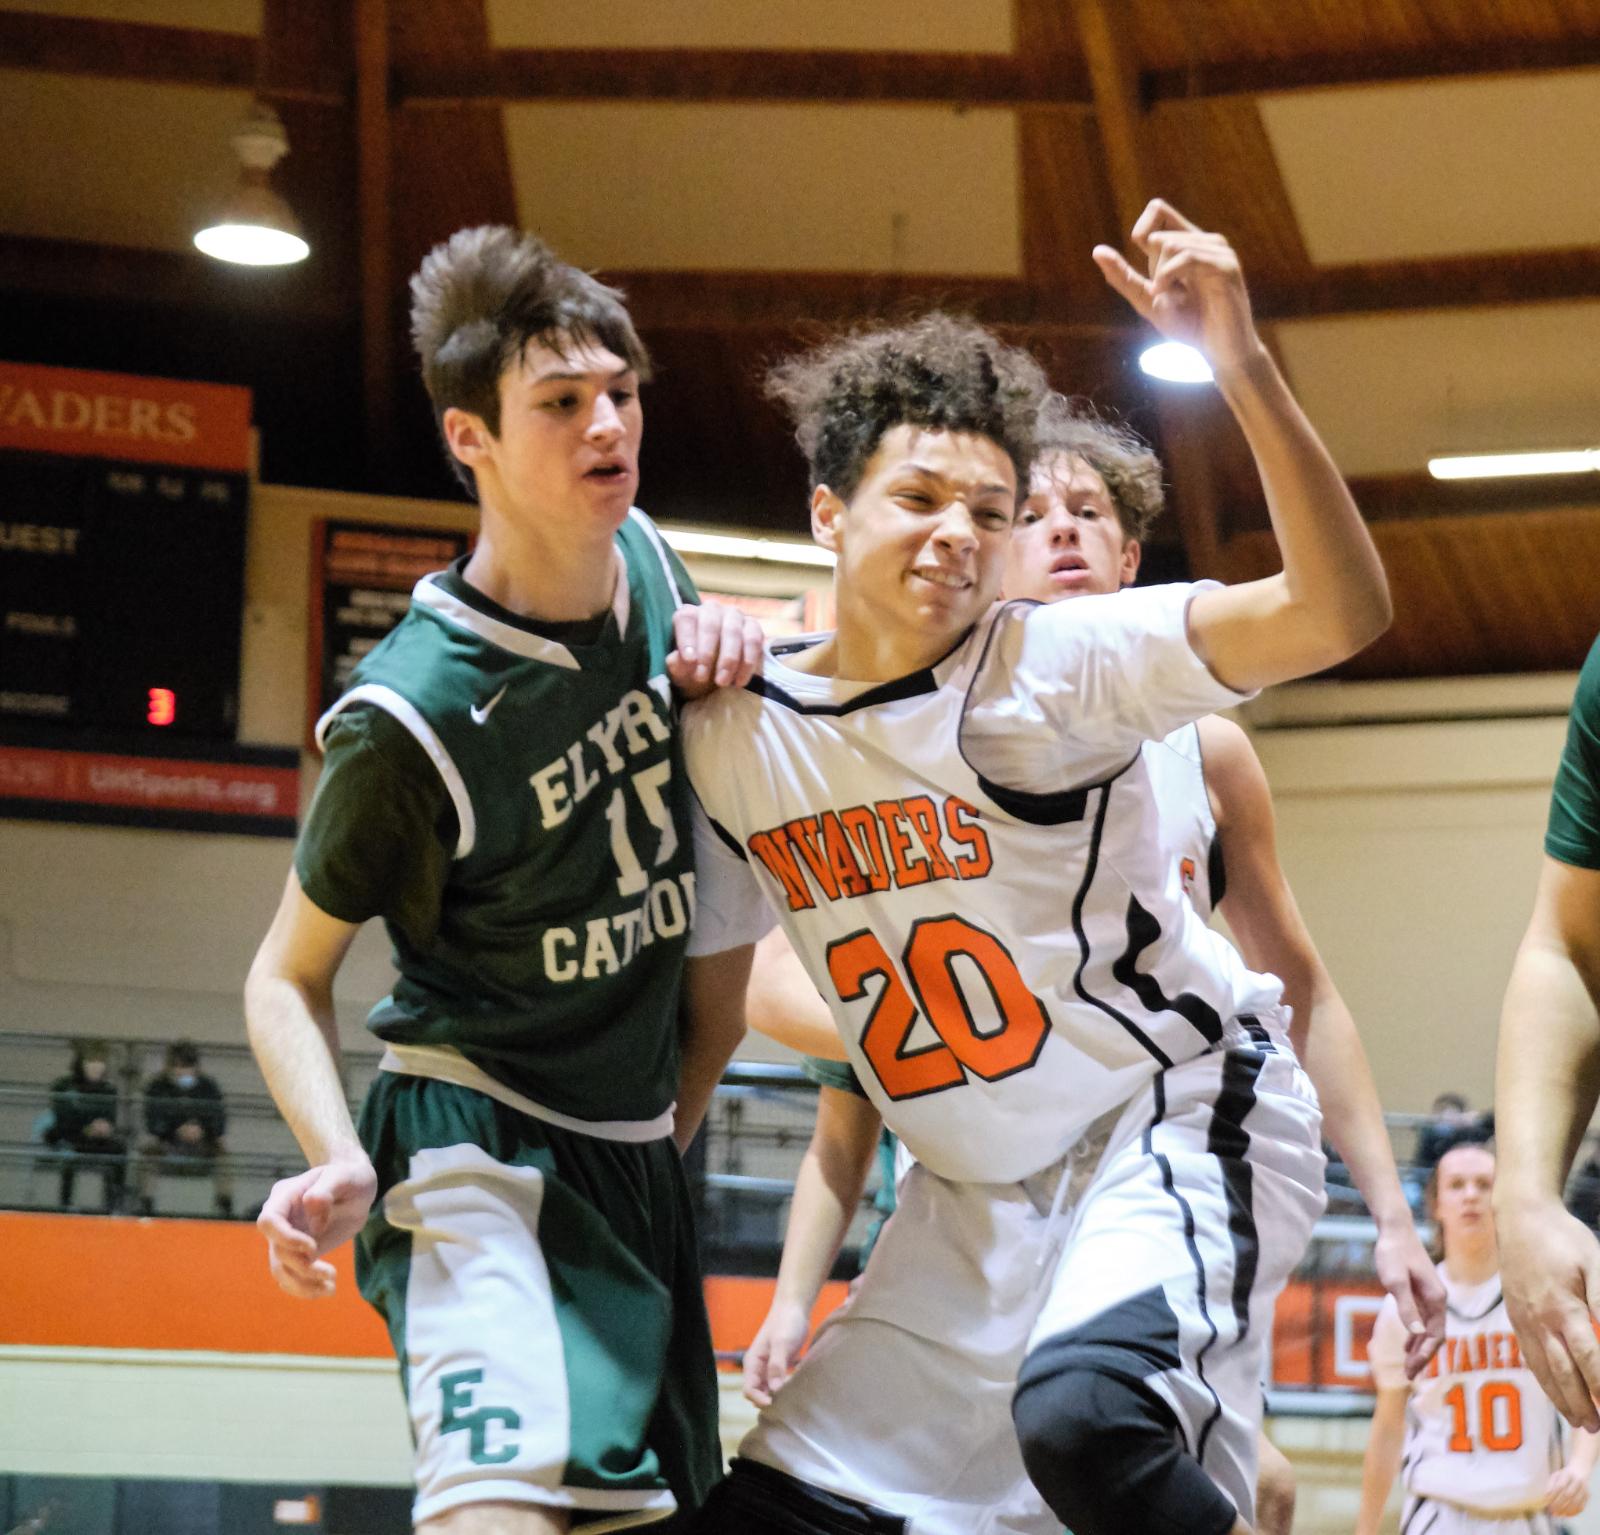 1/5/2021: Freshman & JV Boys Basketball vs. E.C. (Photo Credits: Marc Kirby)